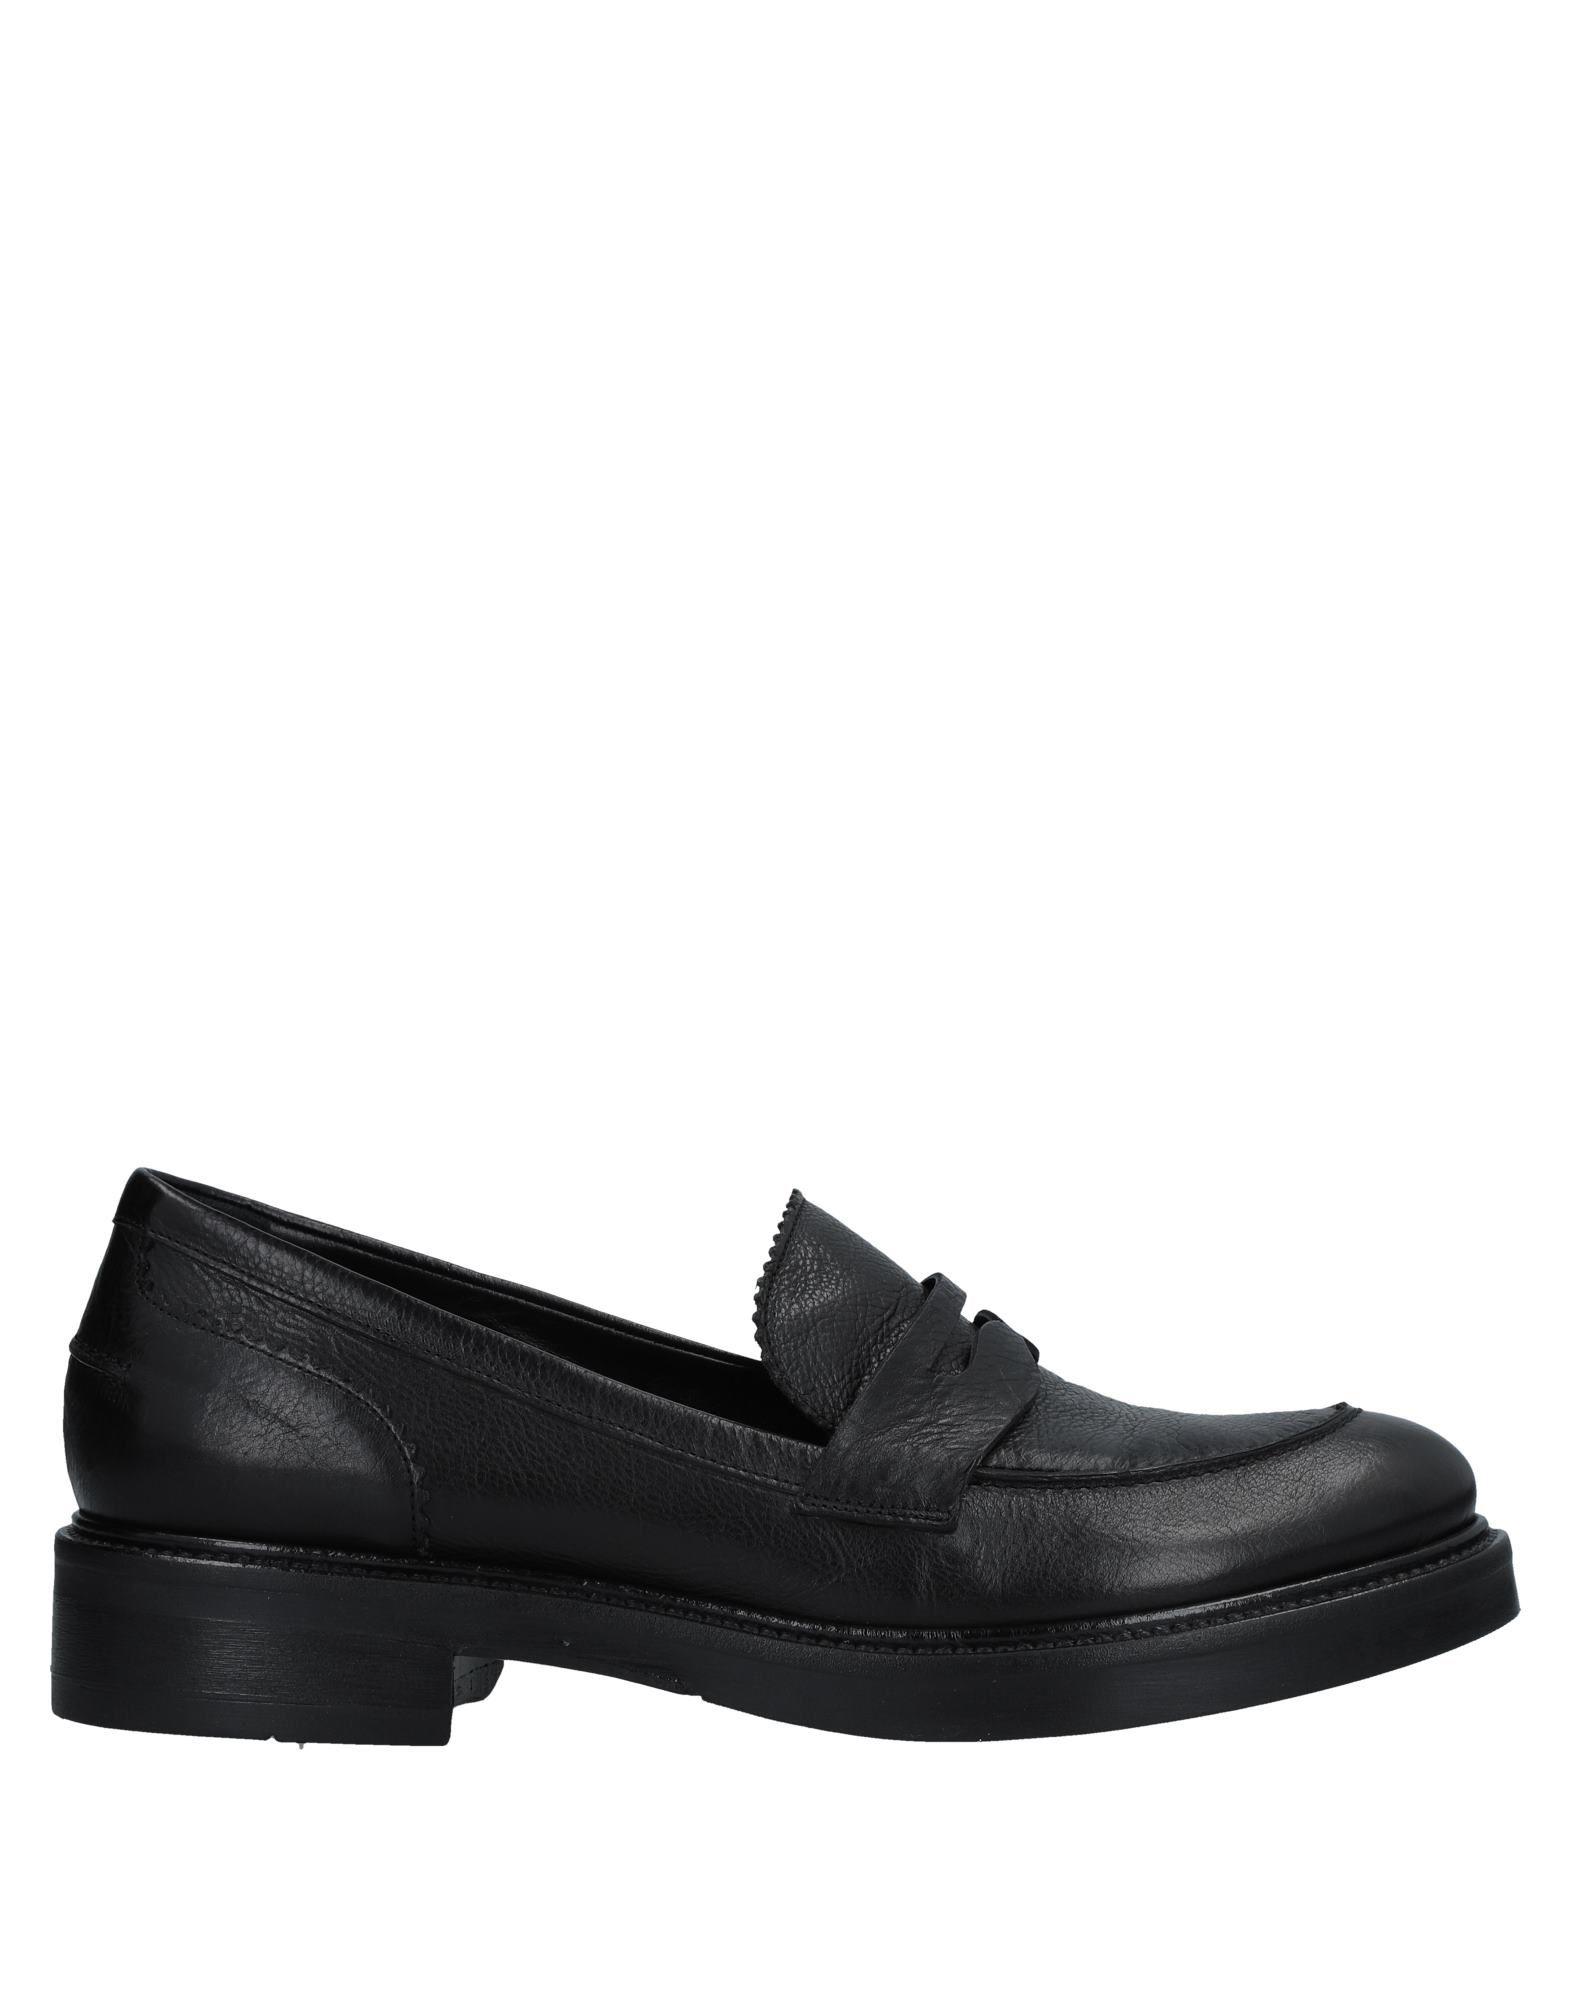 Gut Rotta um billige Schuhe zu tragenGuglielmo Rotta Gut Mokassins Damen  11536192RJ 3caaa1